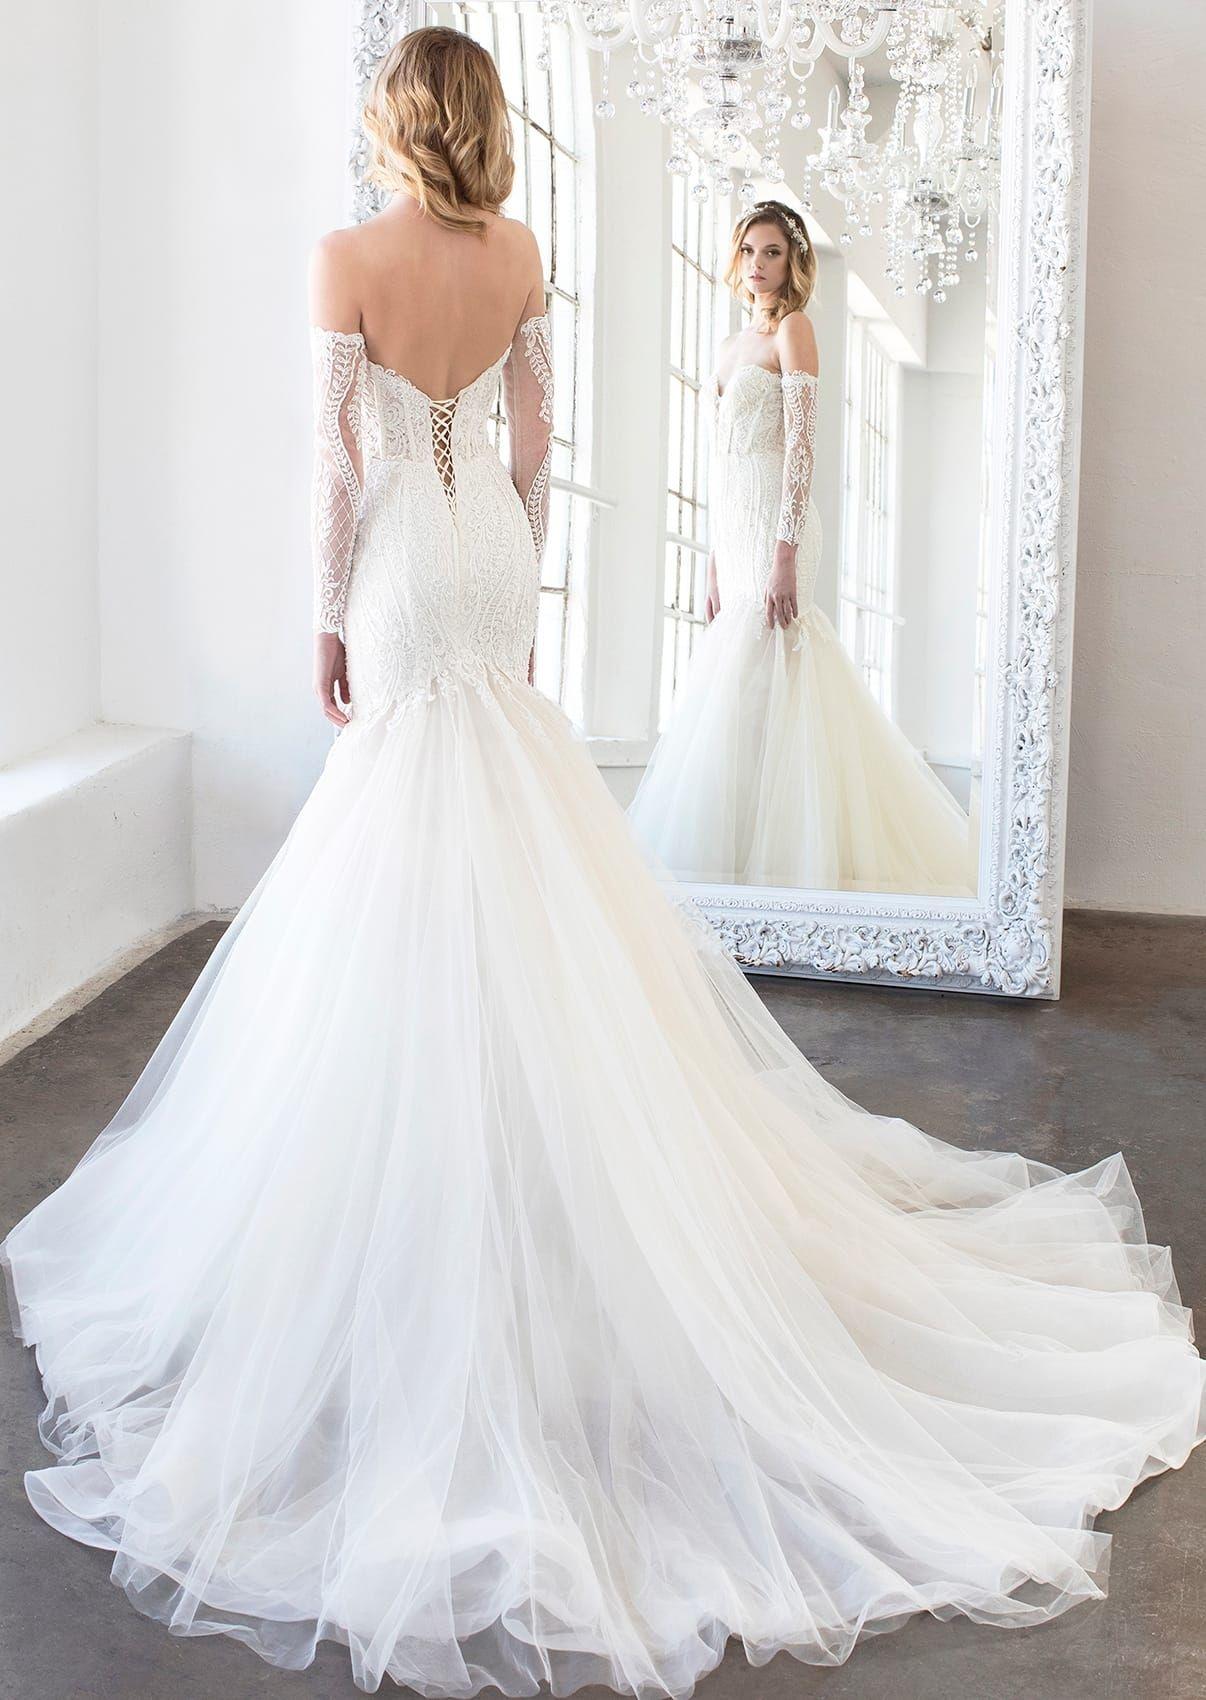 Winnie Couture Wedding Dresses Bridal Gowns By Beverly Hills Celebrity Bridal Designer Wedding Dress Couture Wedding Dresses Unique Designer Wedding Dresses